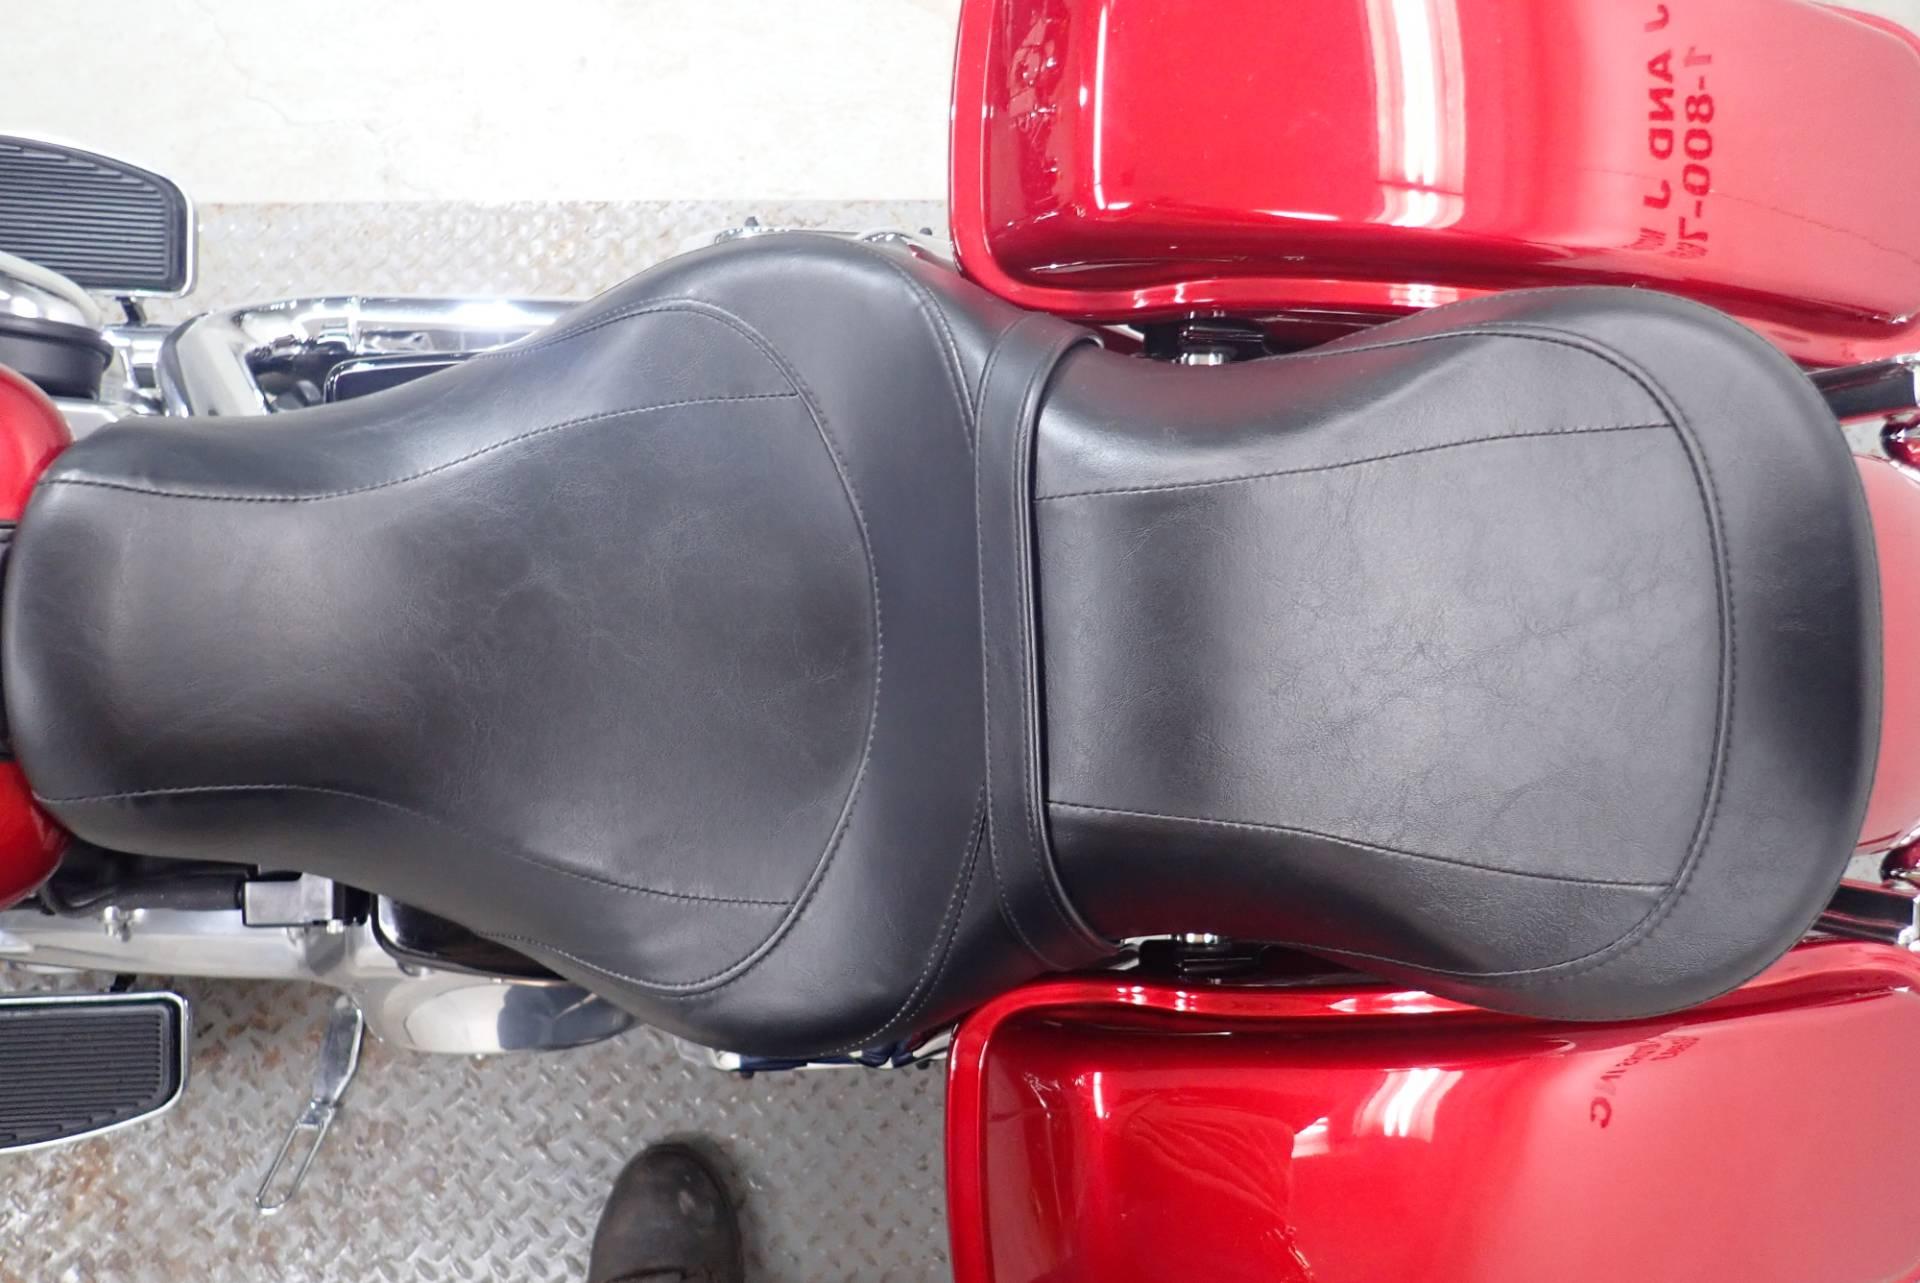 2012 Harley-Davidson Dyna Switchback 10